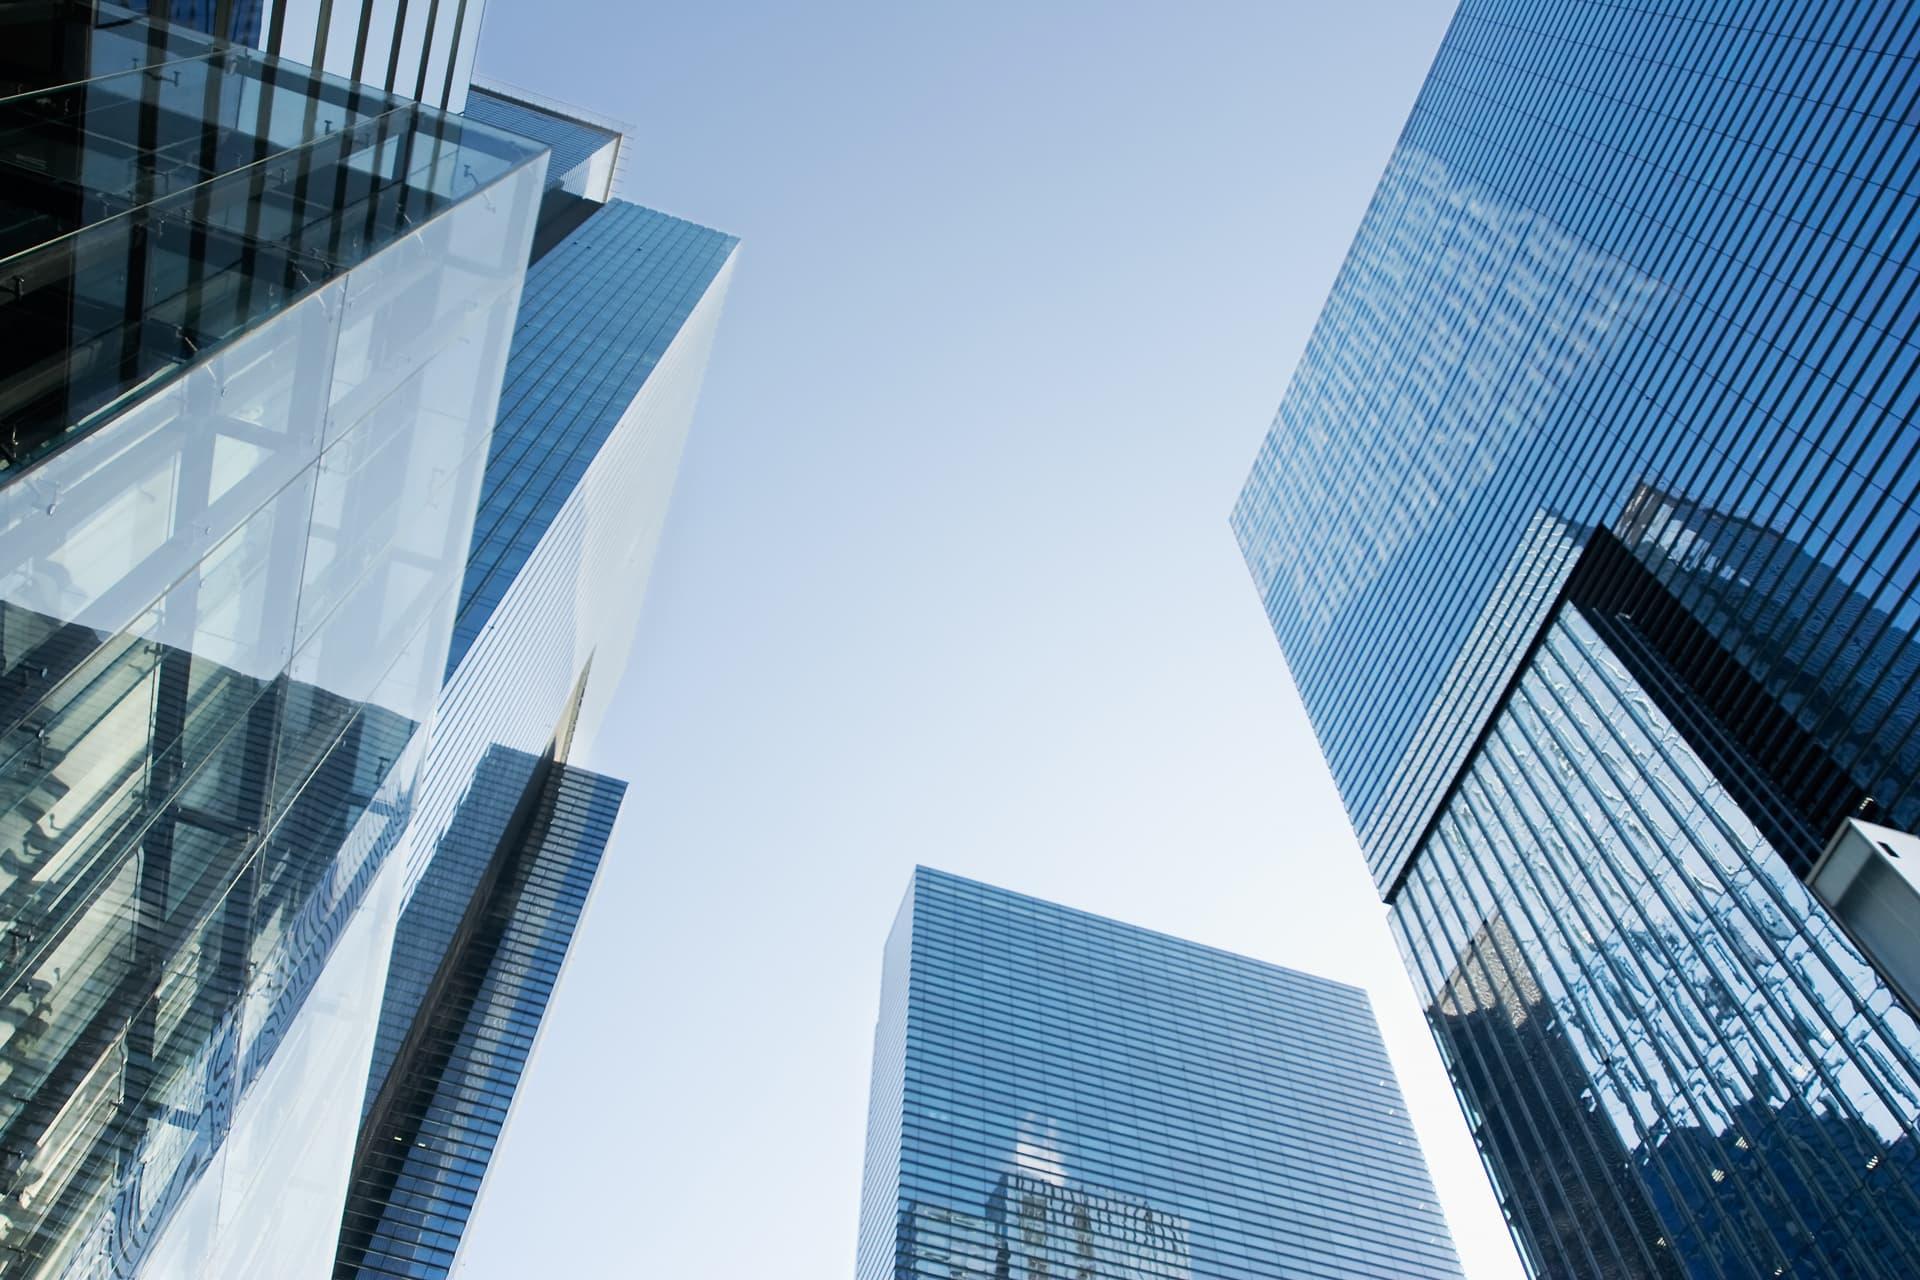 Architecture of Skyscrapers